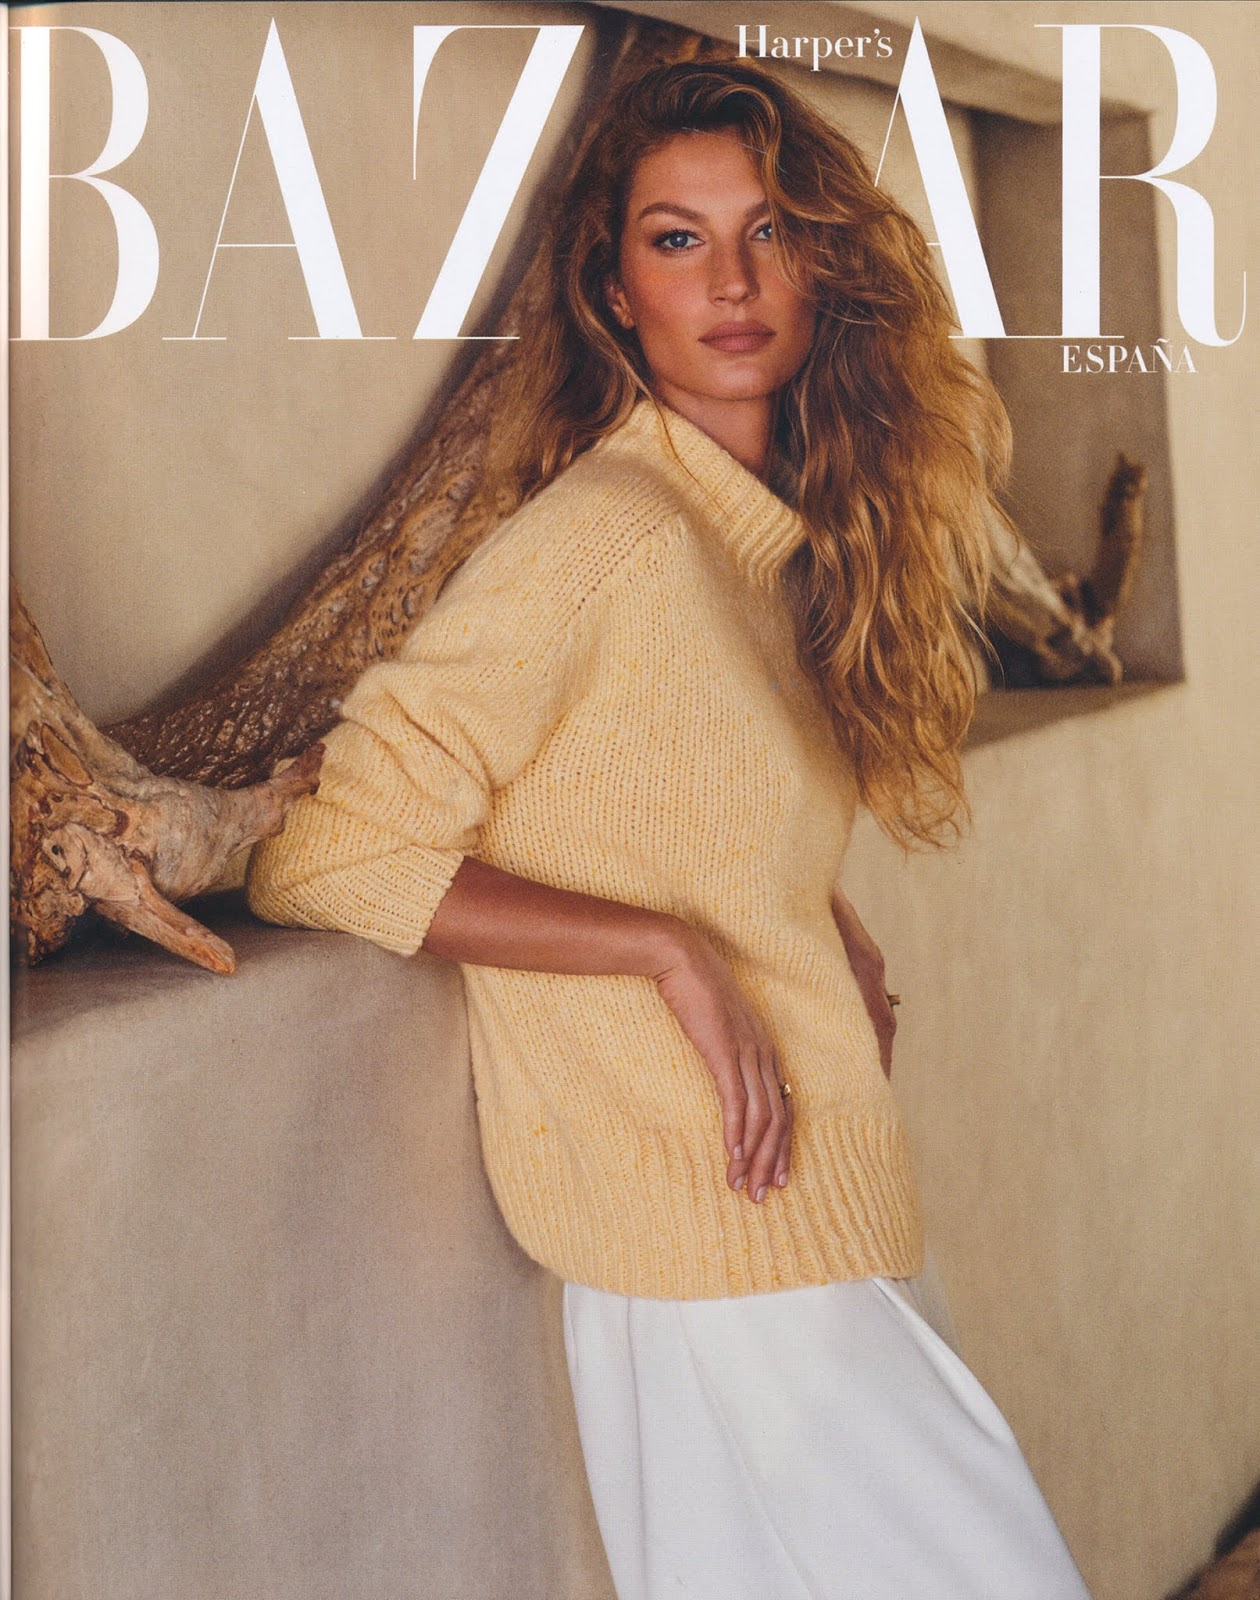 Gisele Bundchen - Harper's Bazaar Spain January 2019